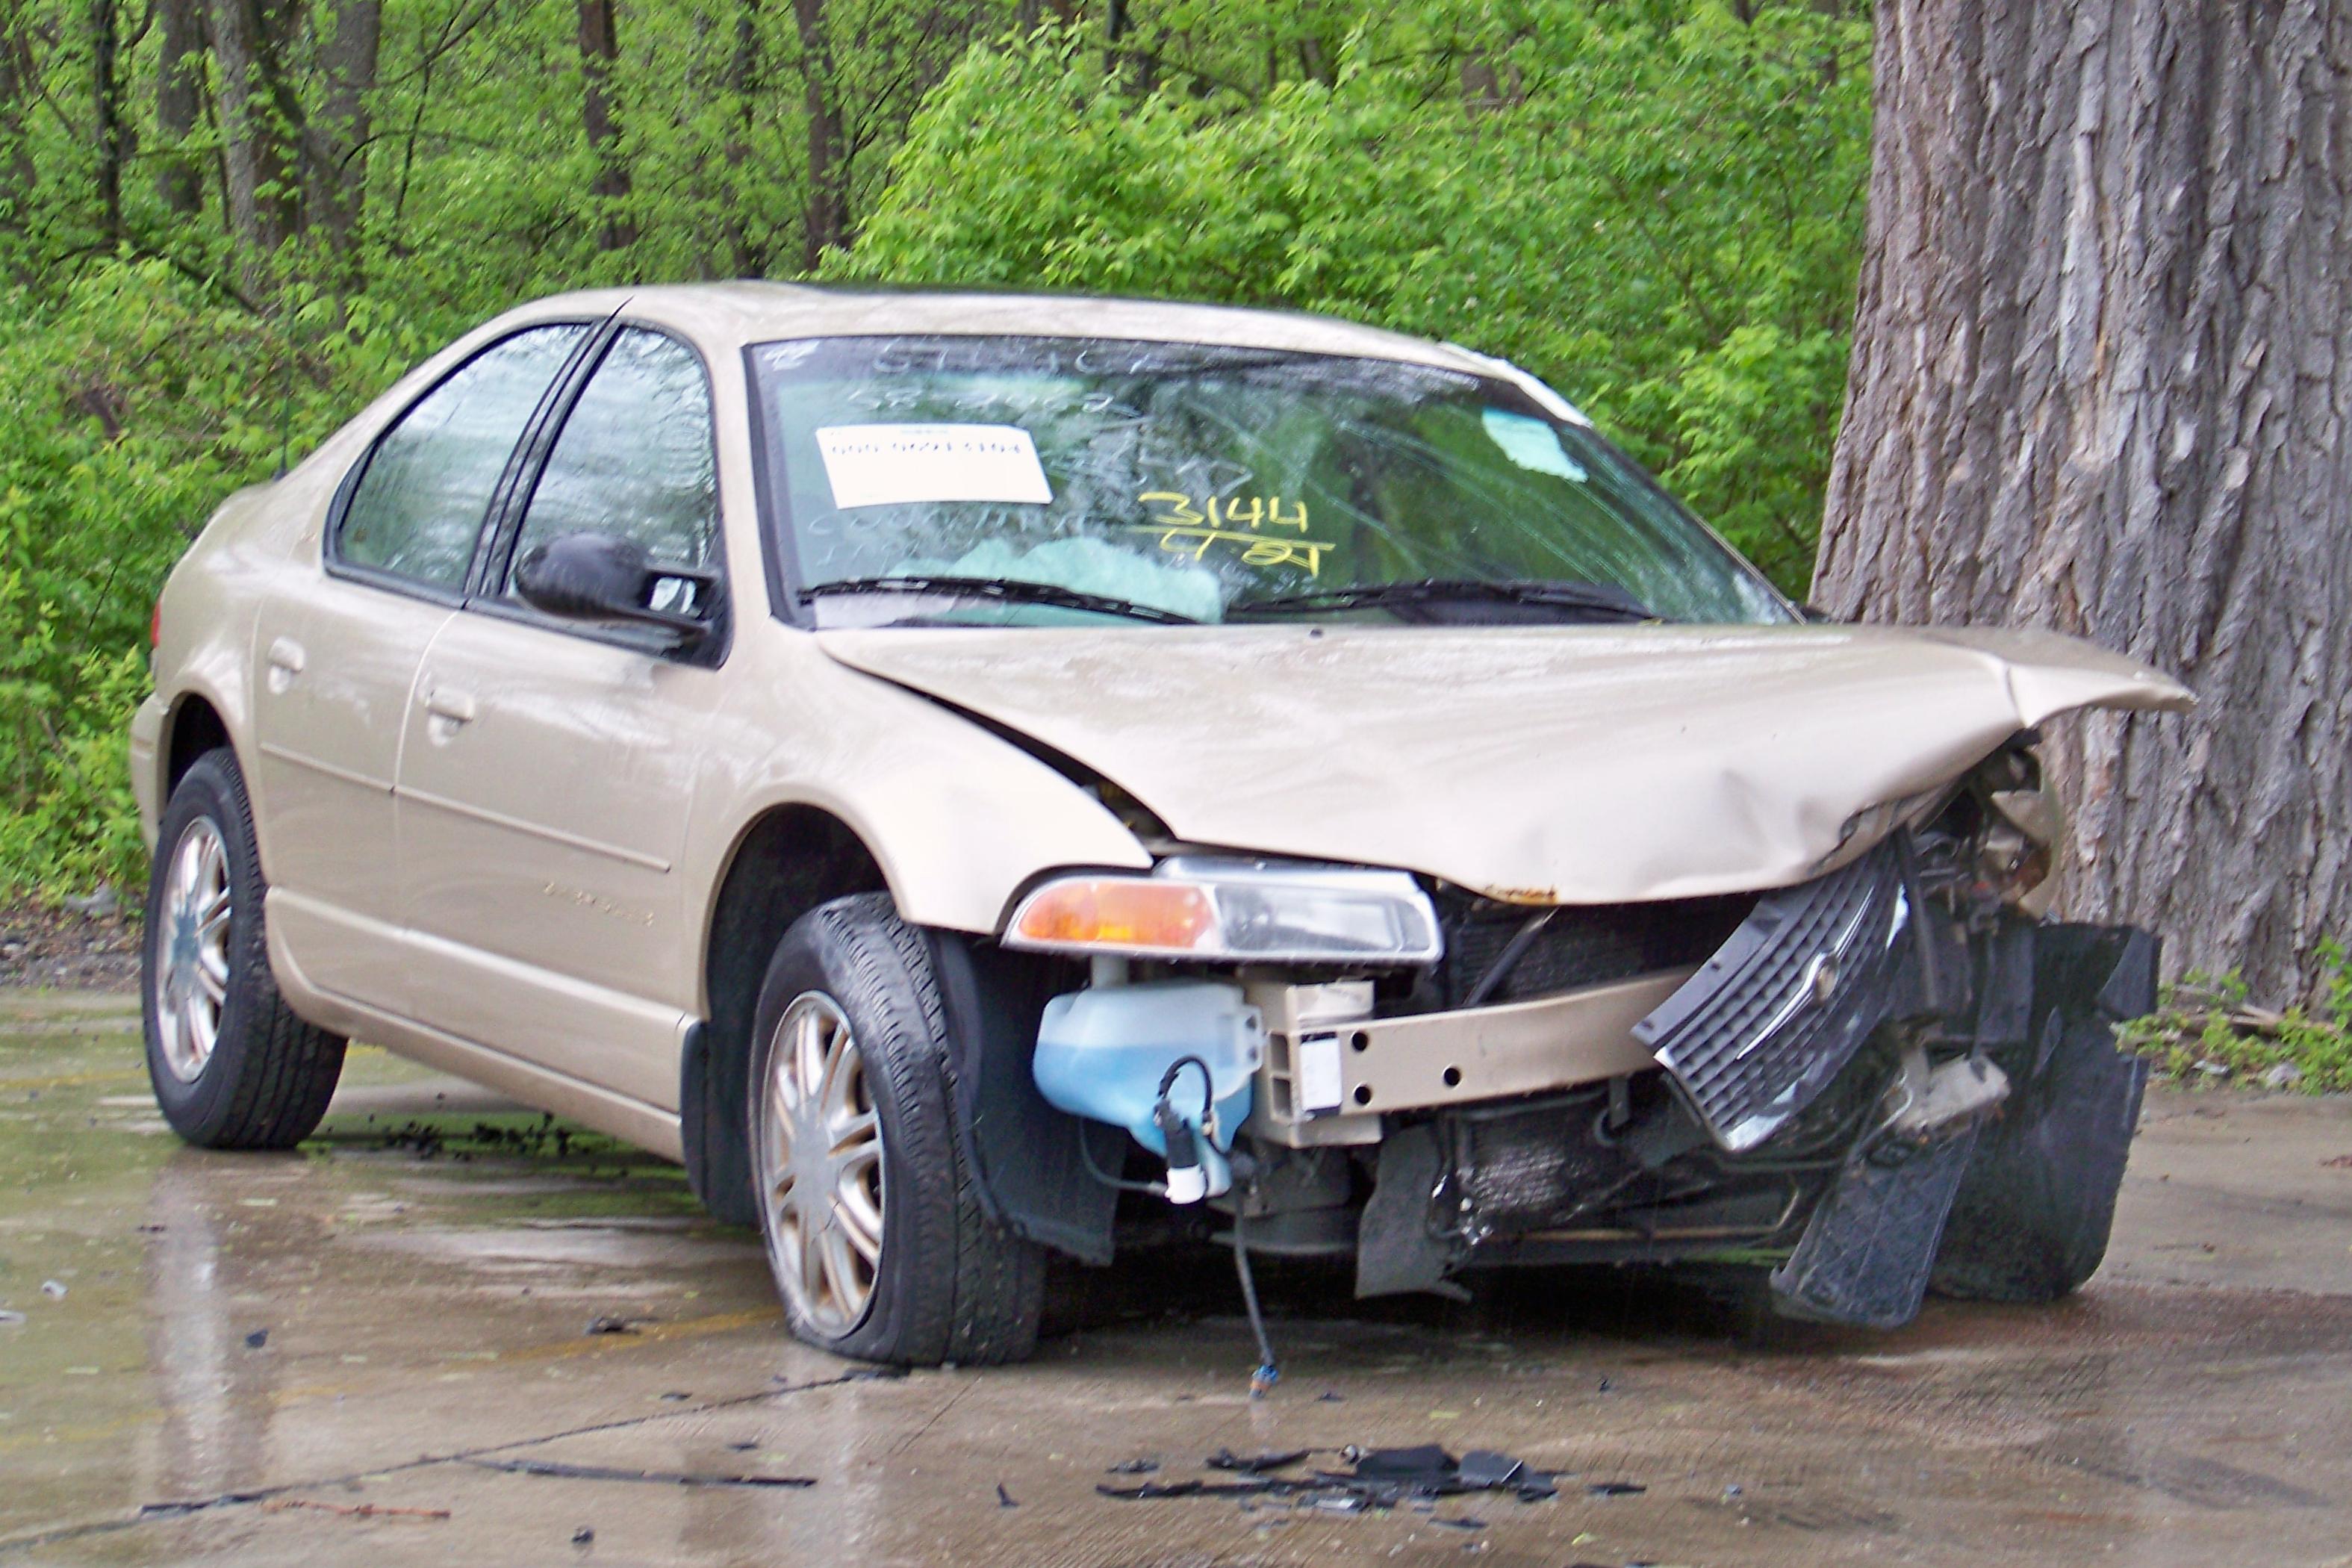 A damaged robot car